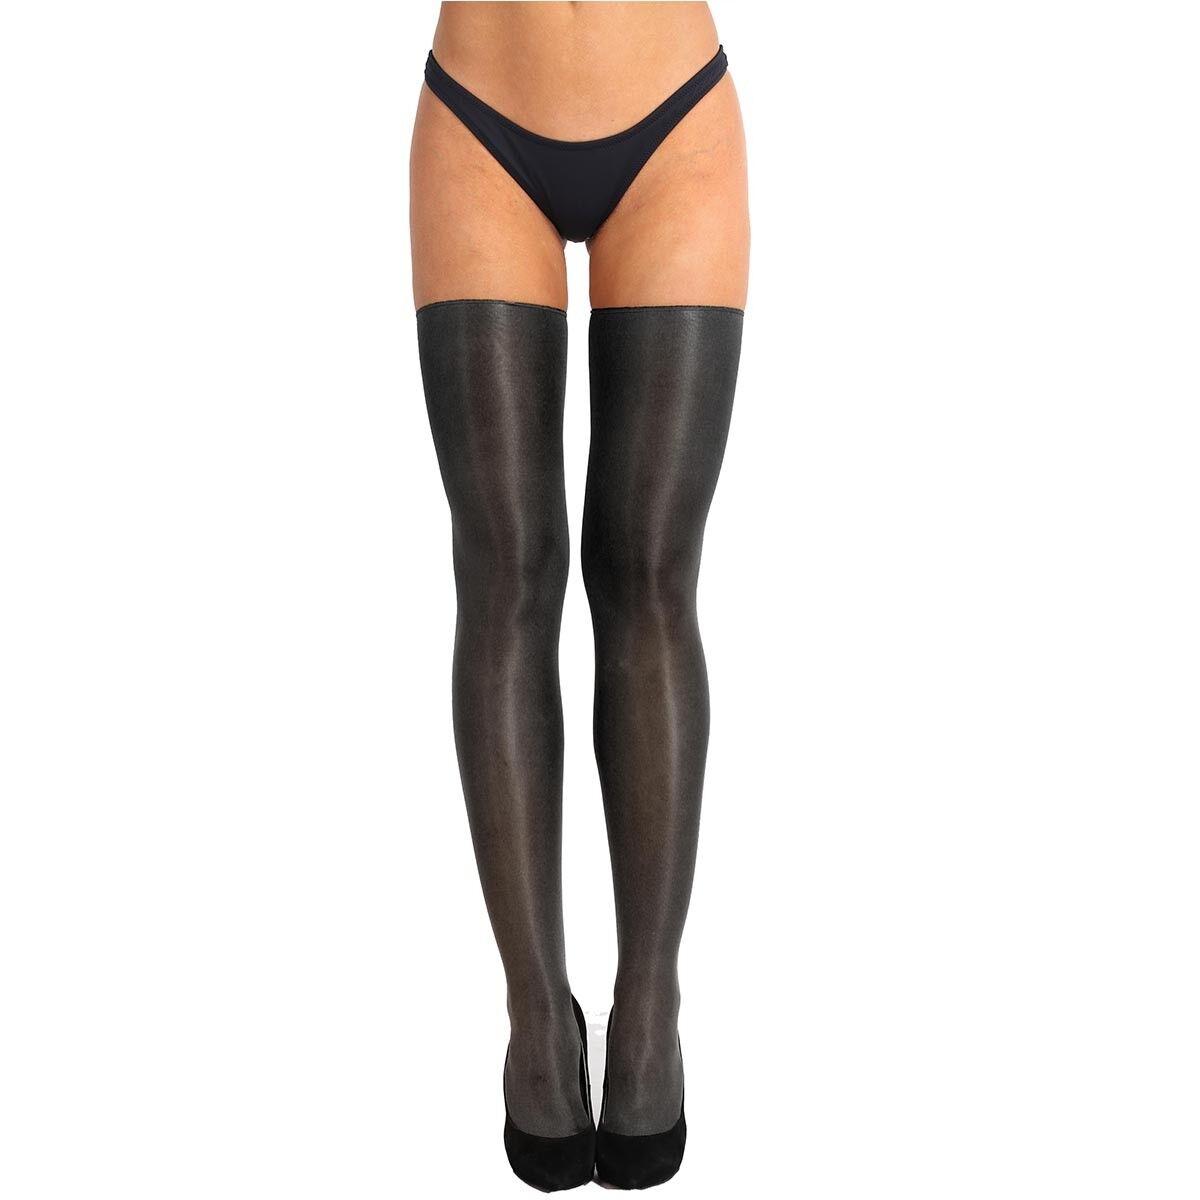 Damen Lange Strümpfe Halb-transparent glänzend Strumpfhose Stützstrümpfe Schwarz